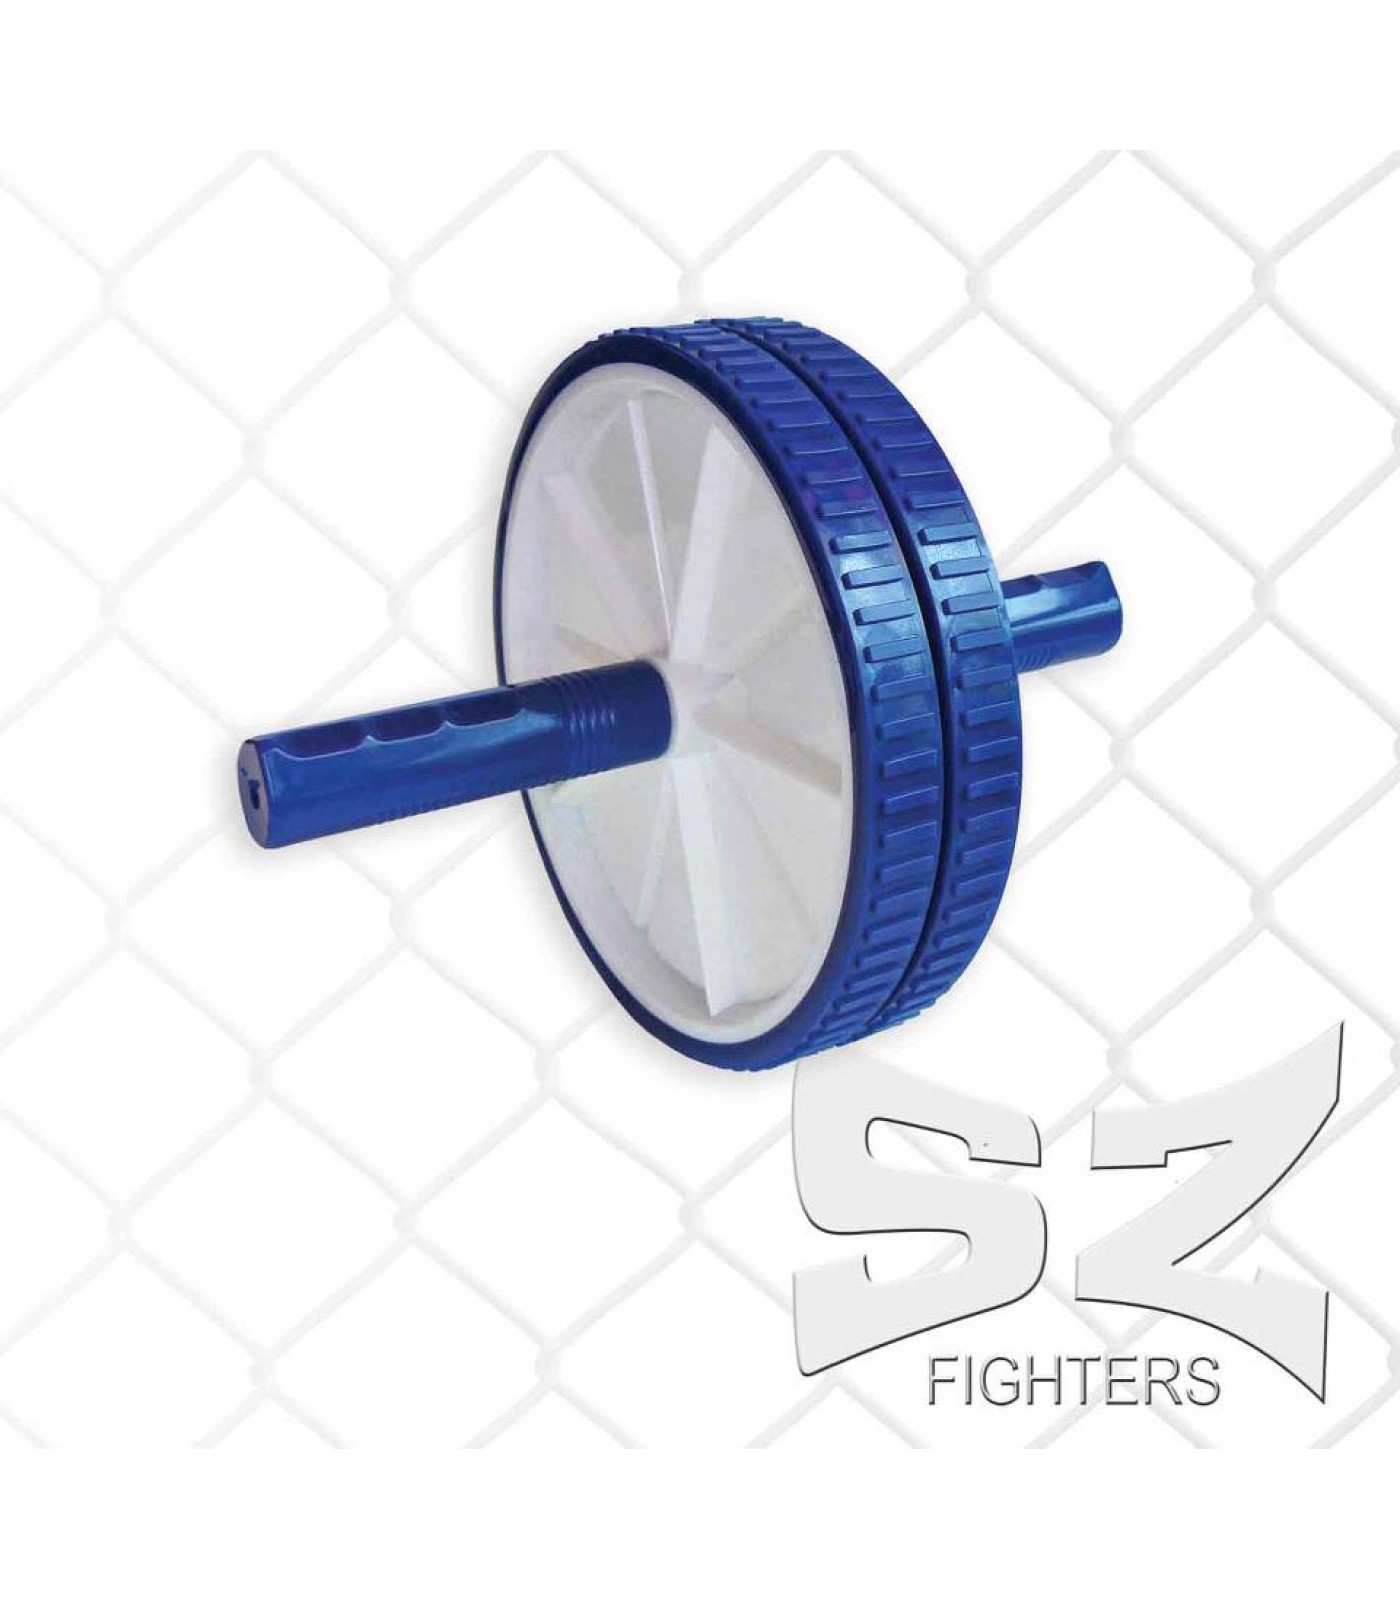 SZ Fighters - Колело за коремни преси